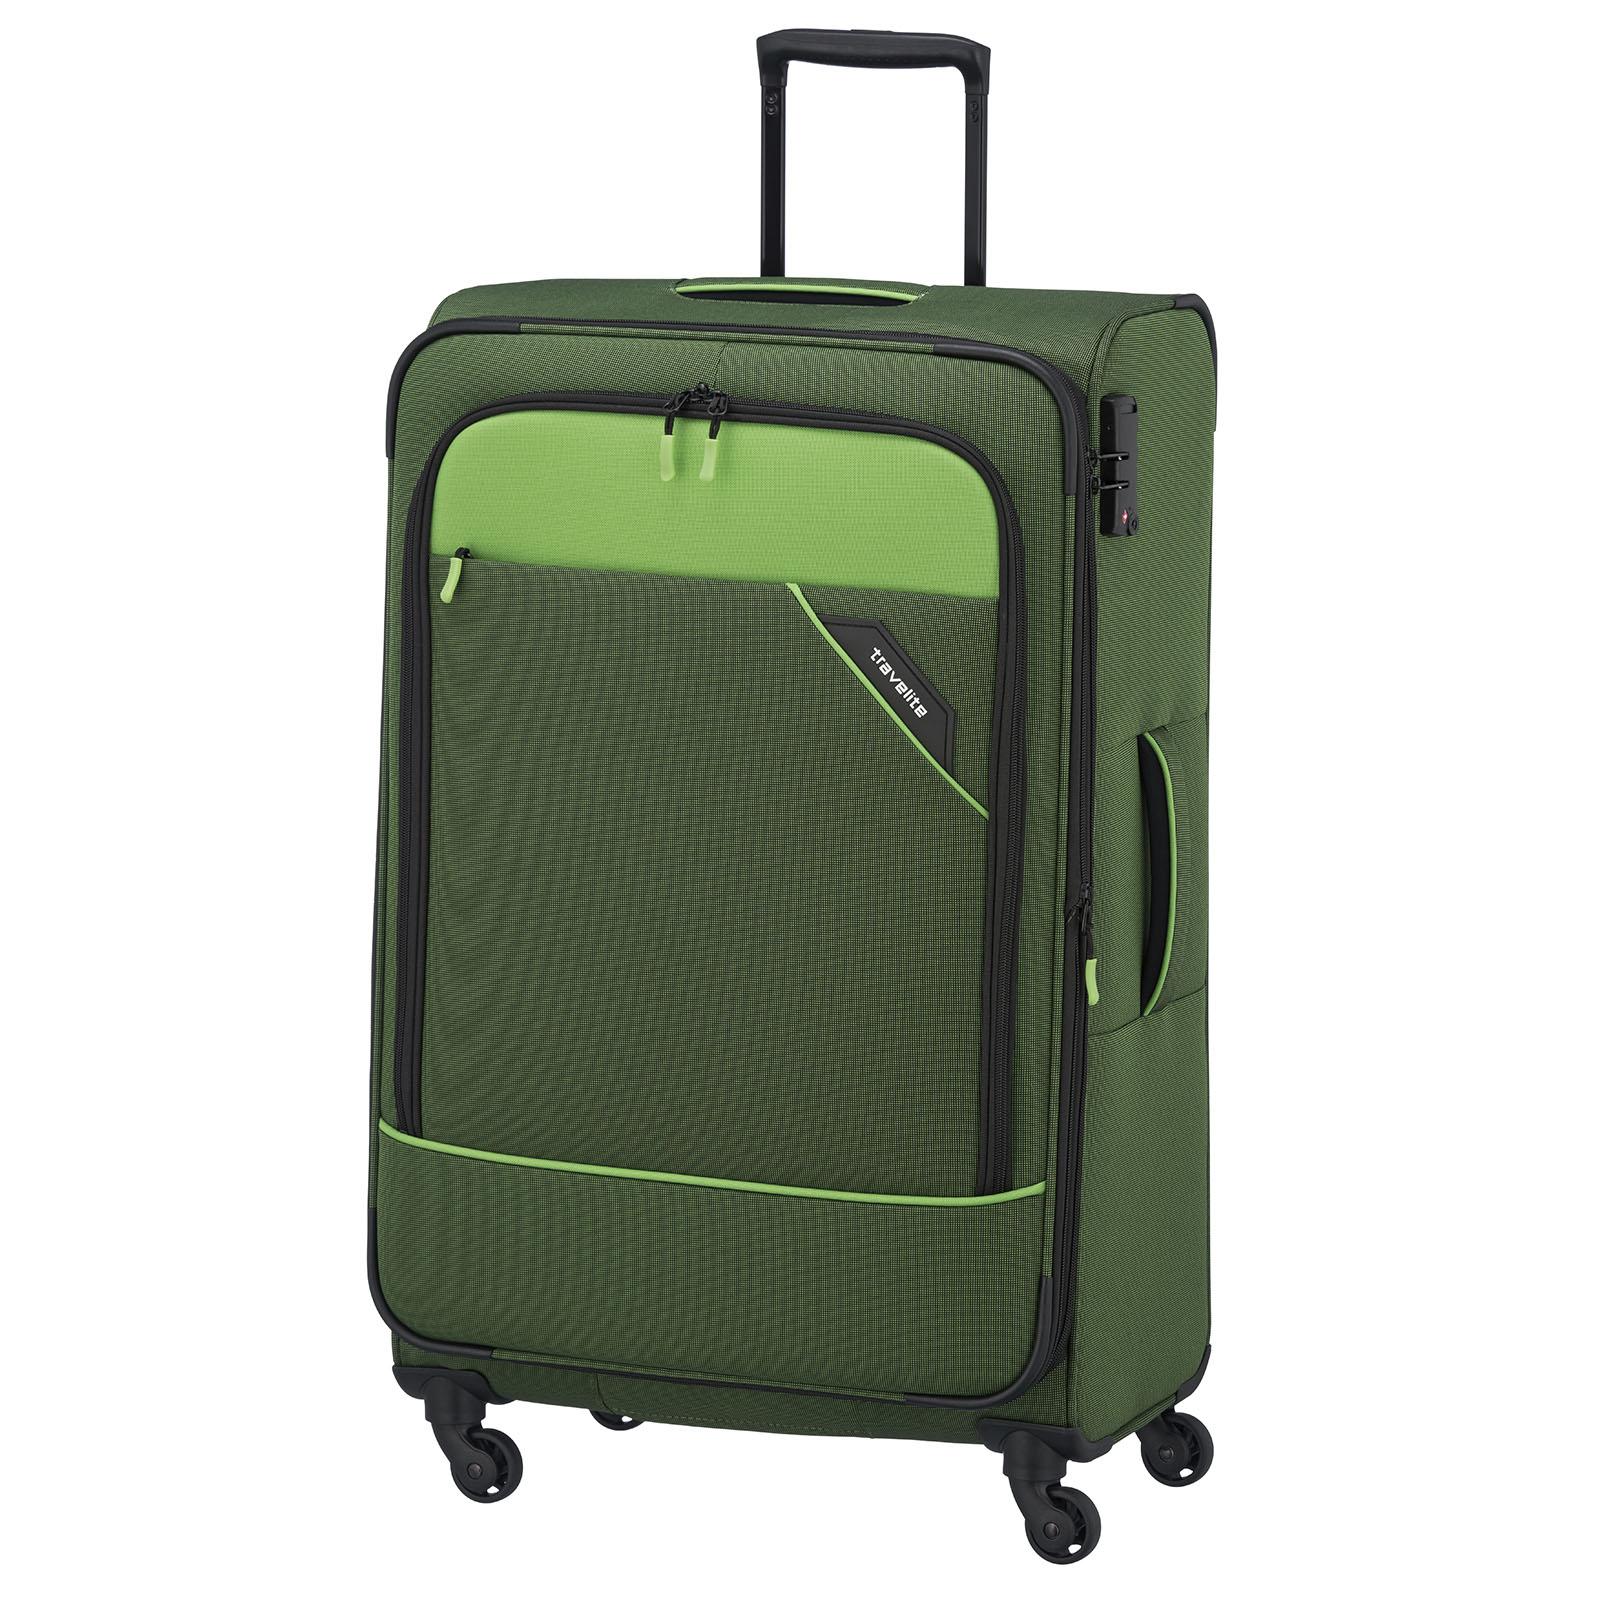 travelite-derby-grun-77cm-stoff-trolley